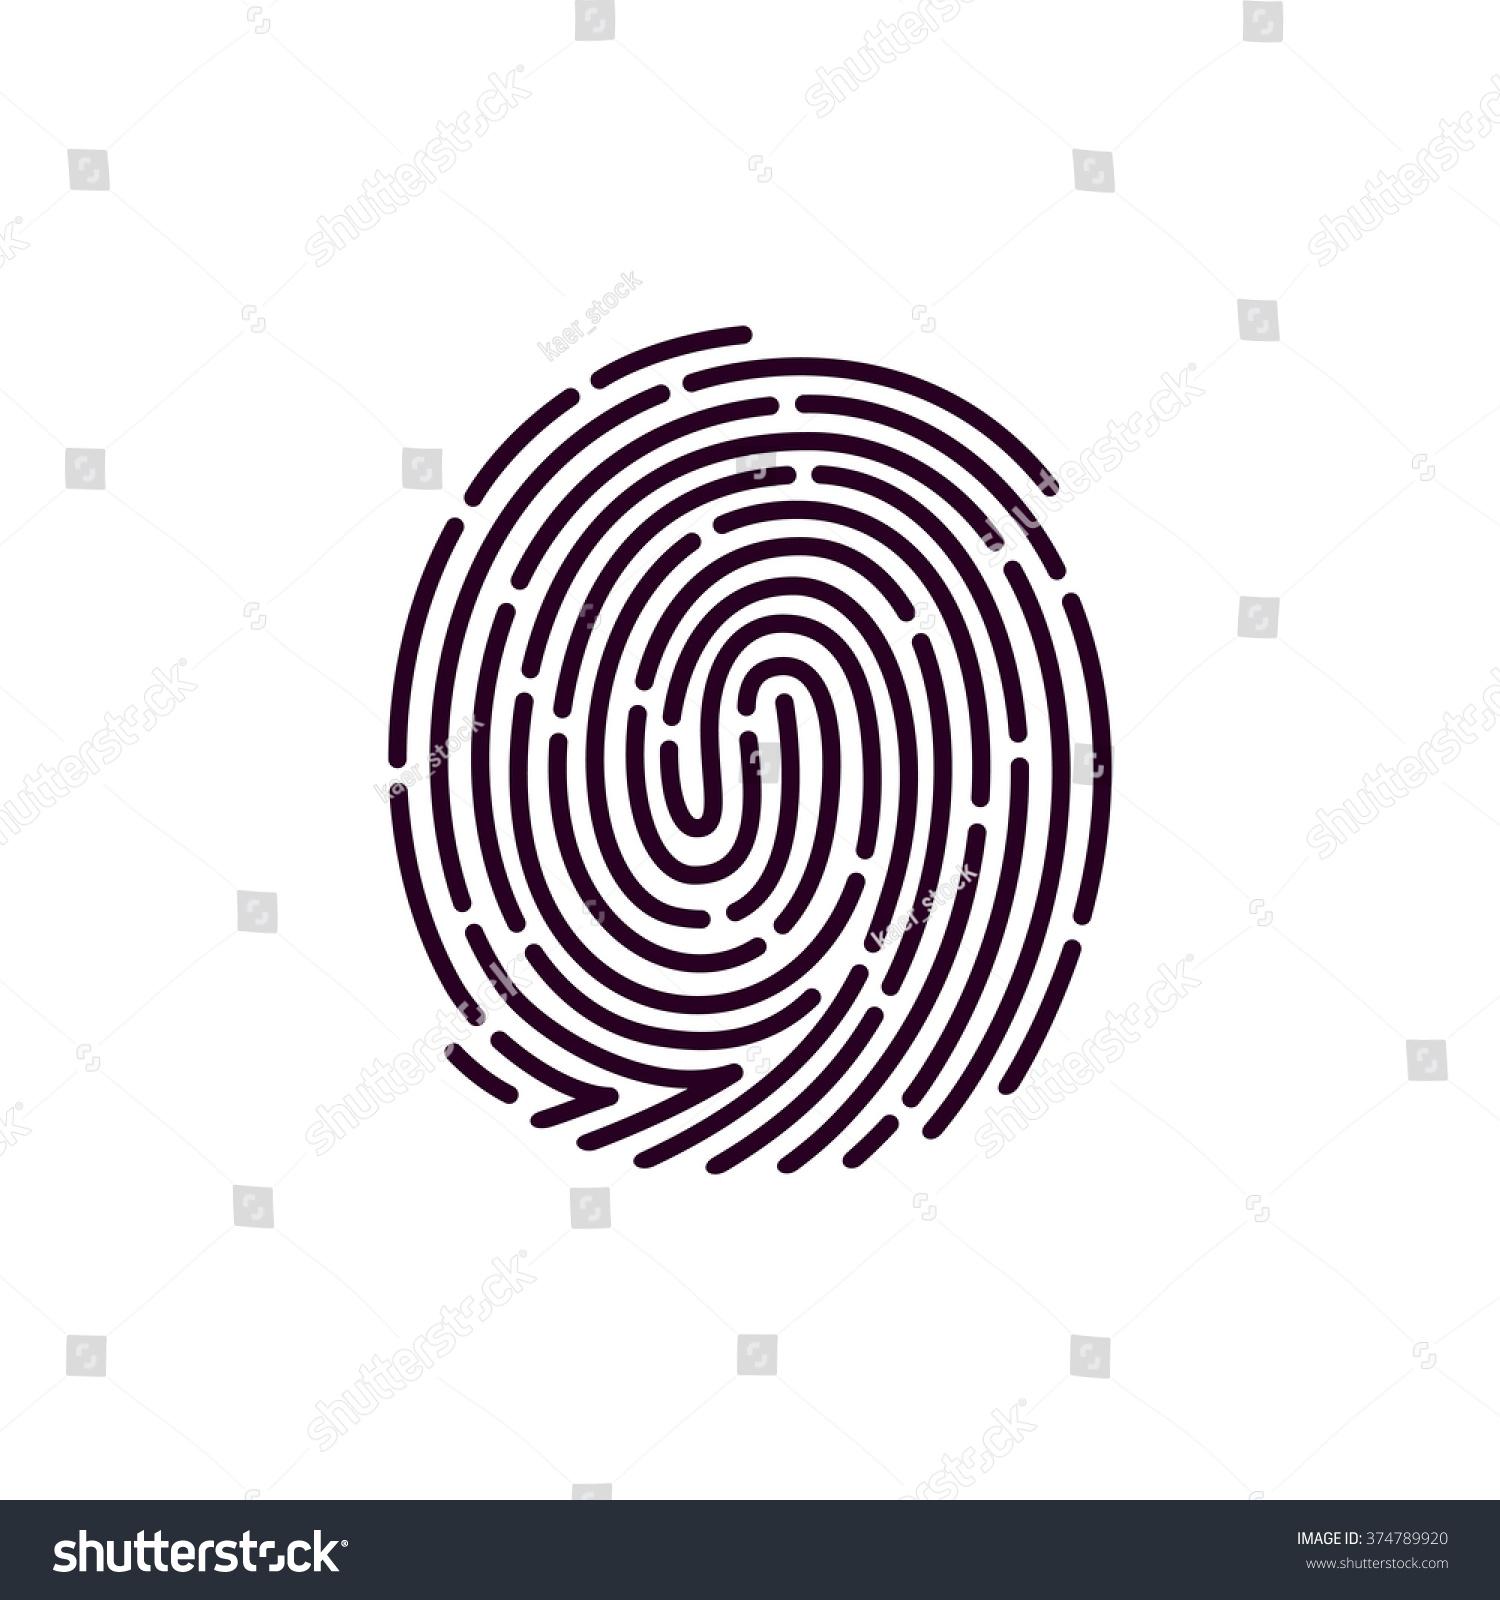 Fingerprint Line Icon Vector Design Template Stock Vector ...